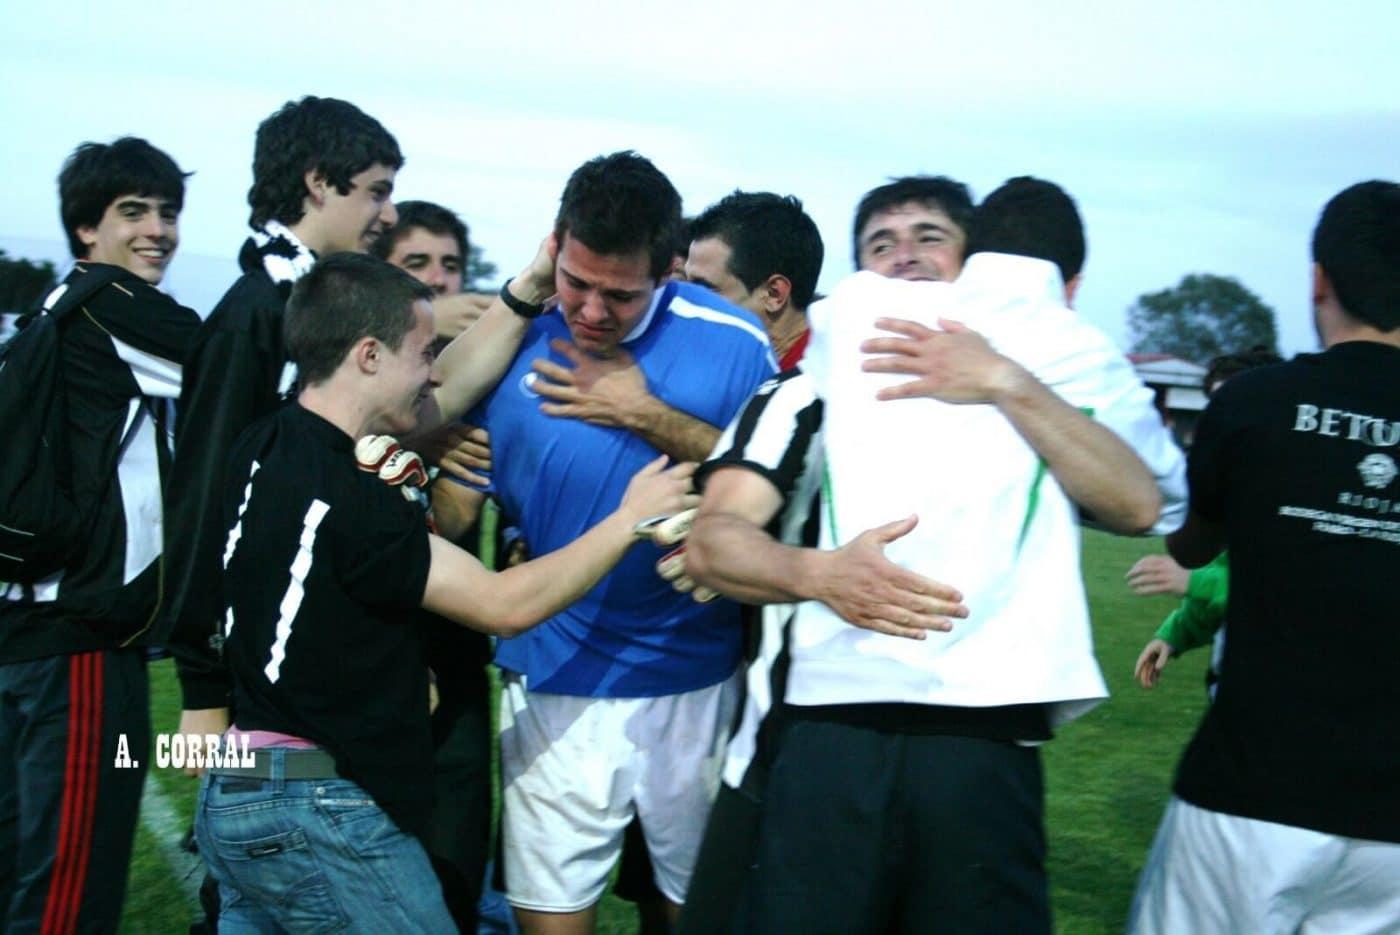 Javi Pérez dice adiós a media vida en el Haro Deportivo 1